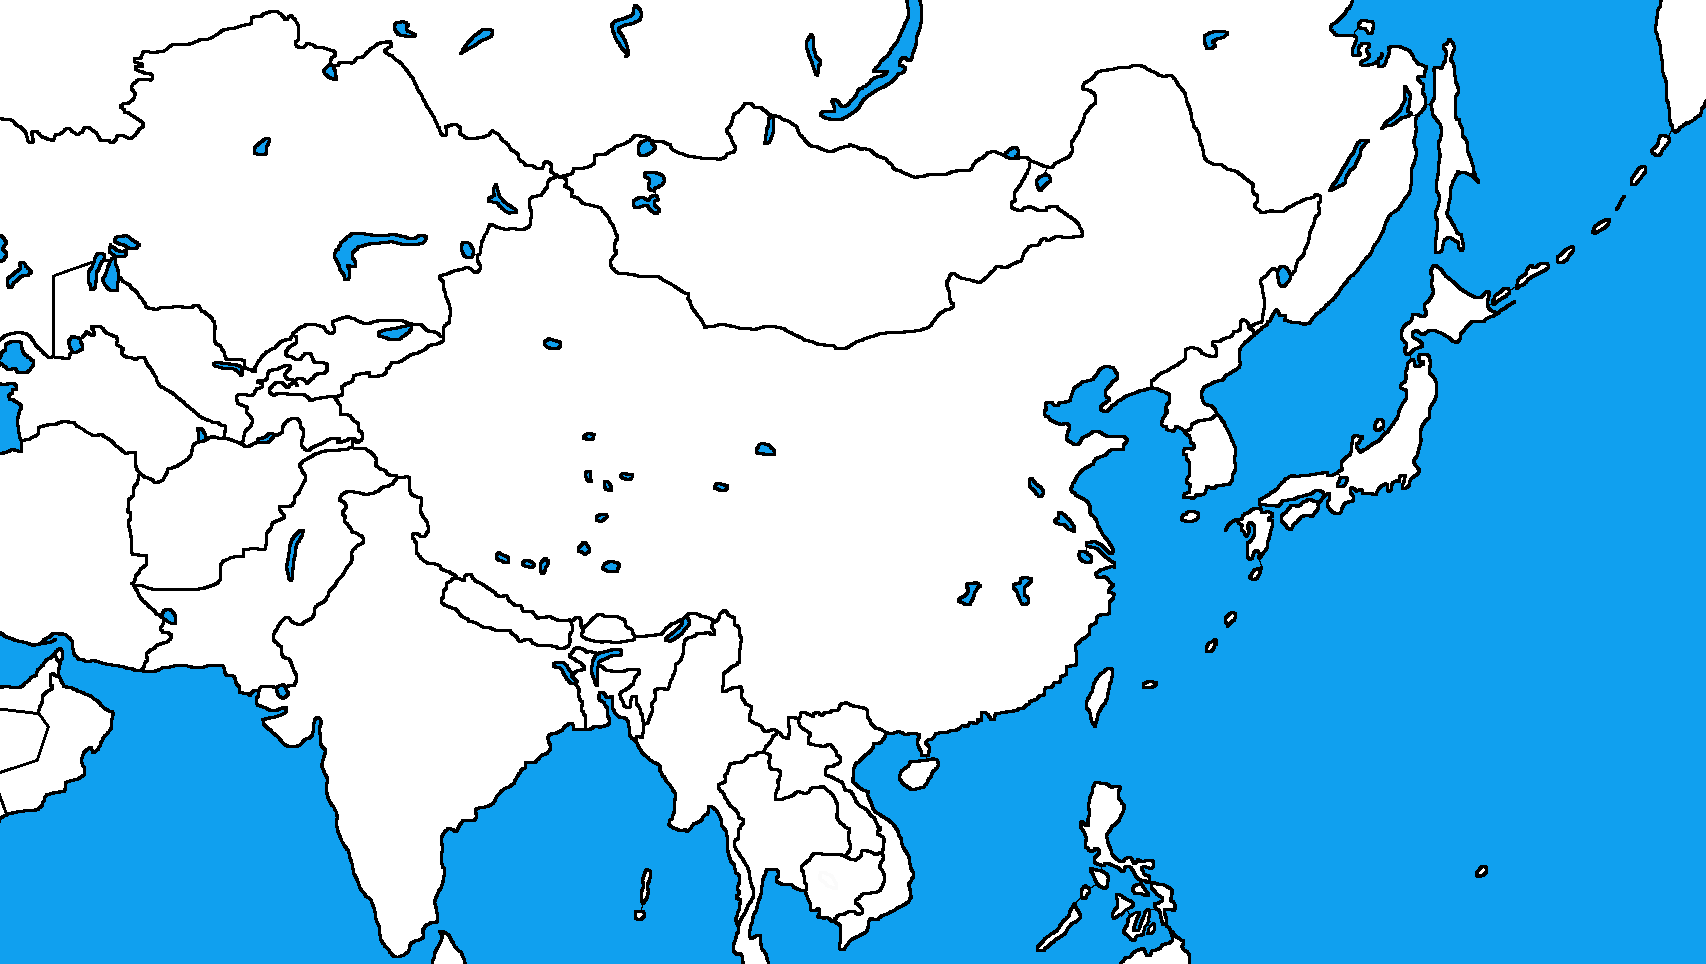 The Blank Atlas - Maps